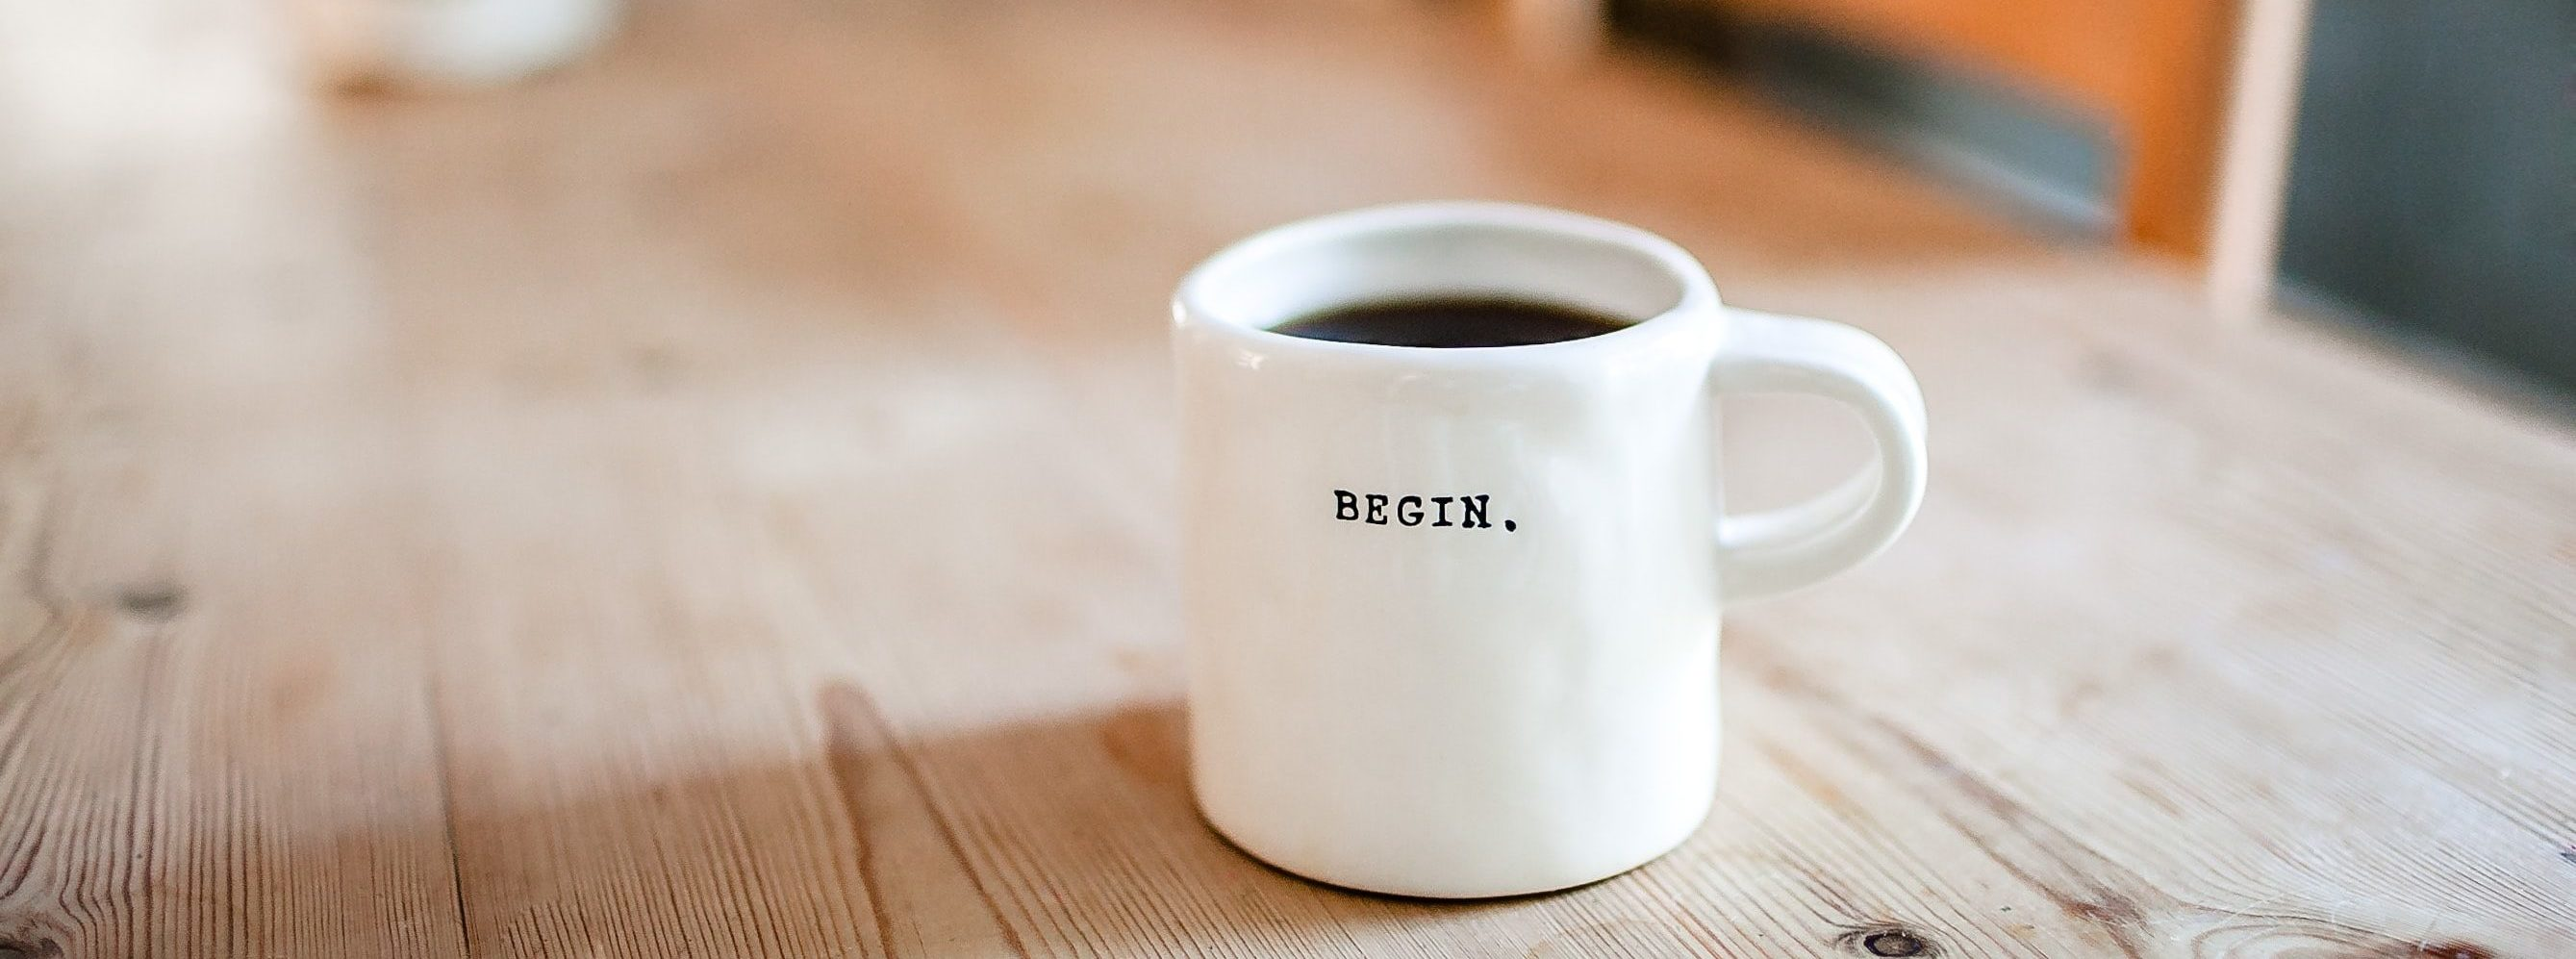 image of coffee mug on a desk